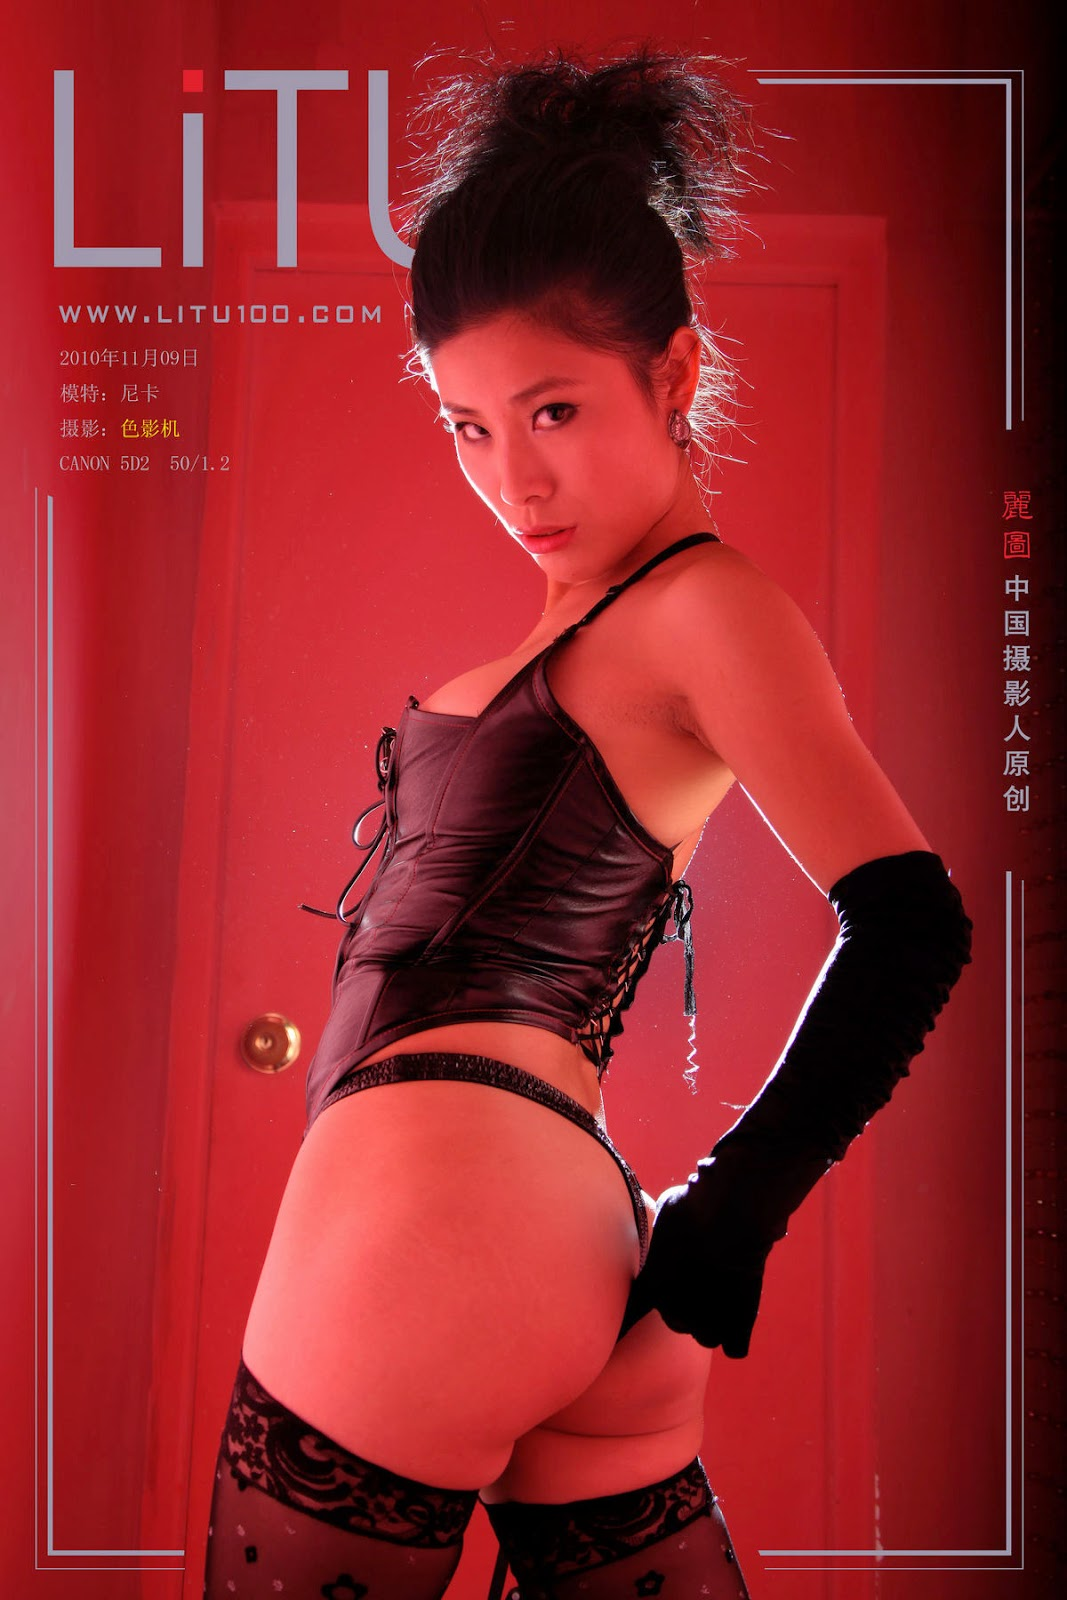 Chinese Nude Model Ni Ka  [Litu100]  | 18+ gallery photos